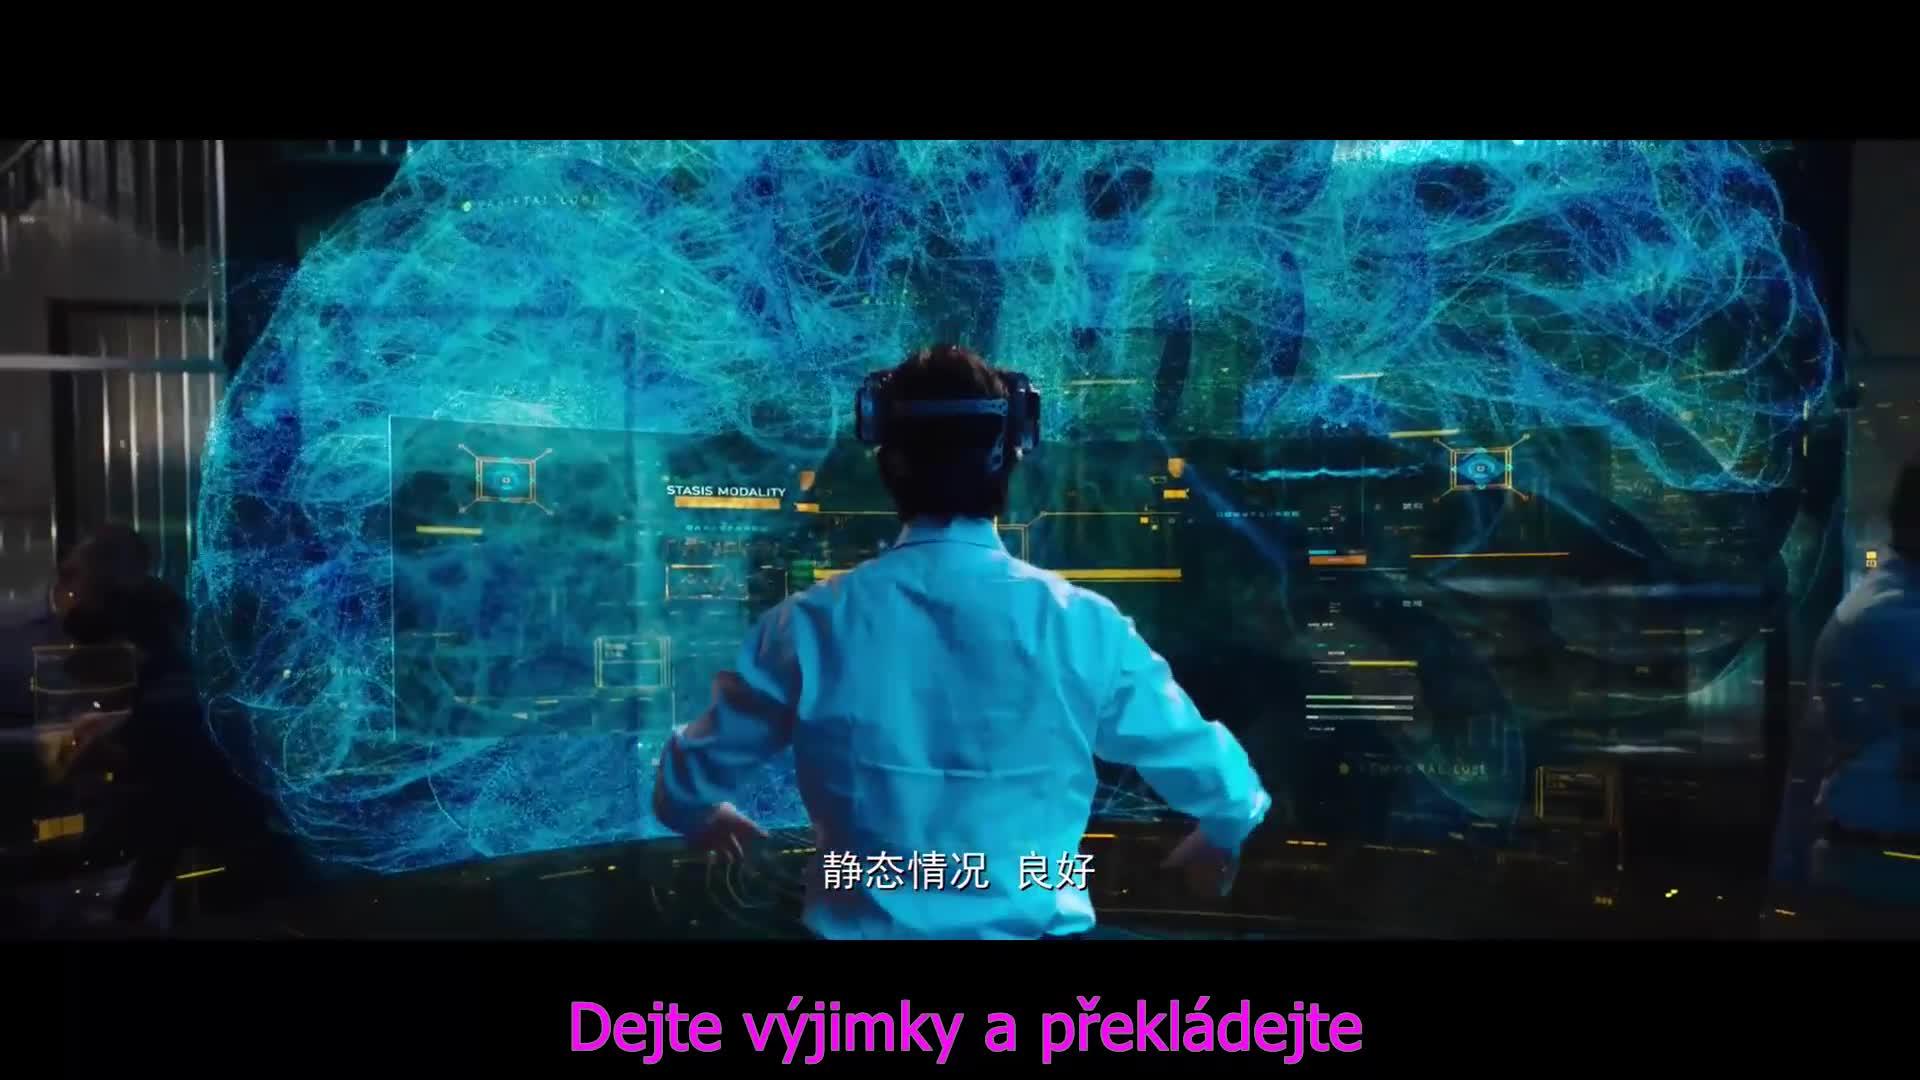 Replicas 2018 CZ tit v obraze Super 1080p HC WEBRip MkvCage Sci Fi Novinka